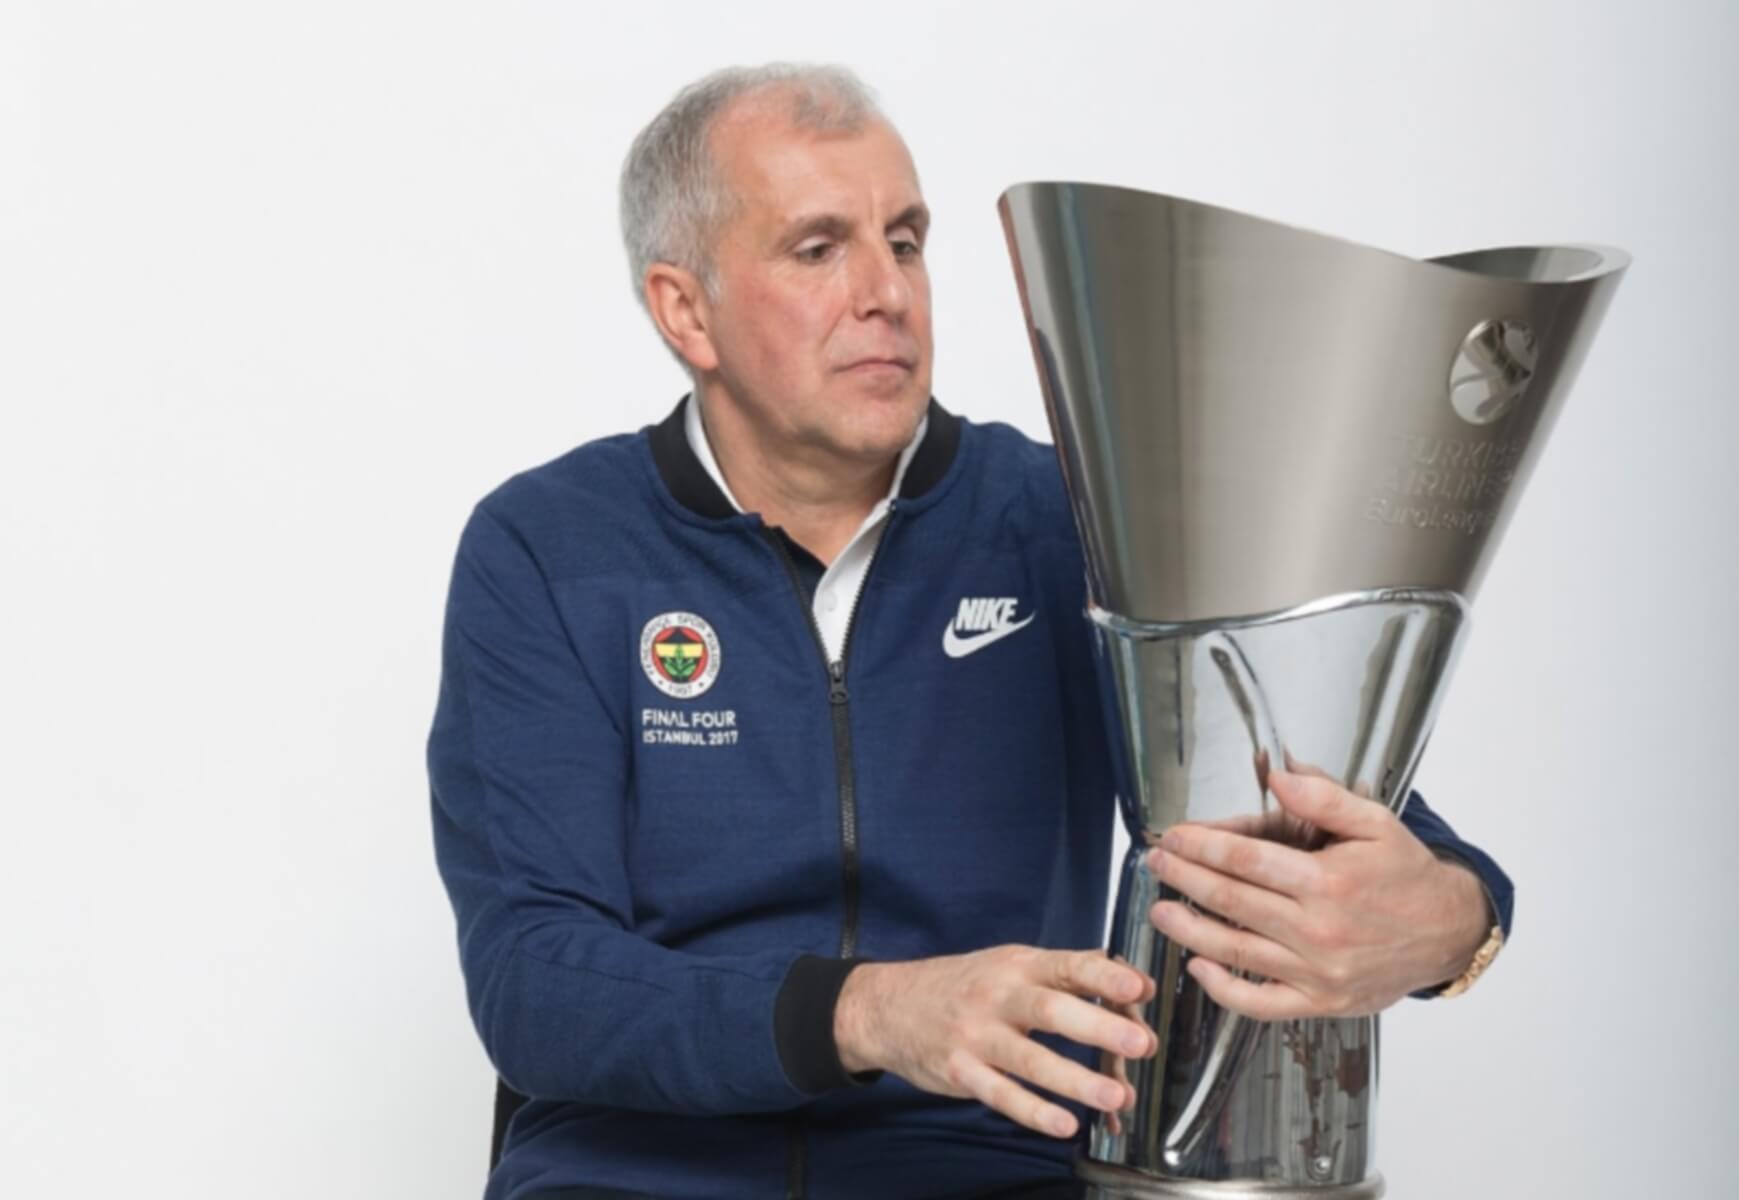 Euroleague: Ο Ομπράντοβιτς πρόεδρος της Ένωσης προπονητών!